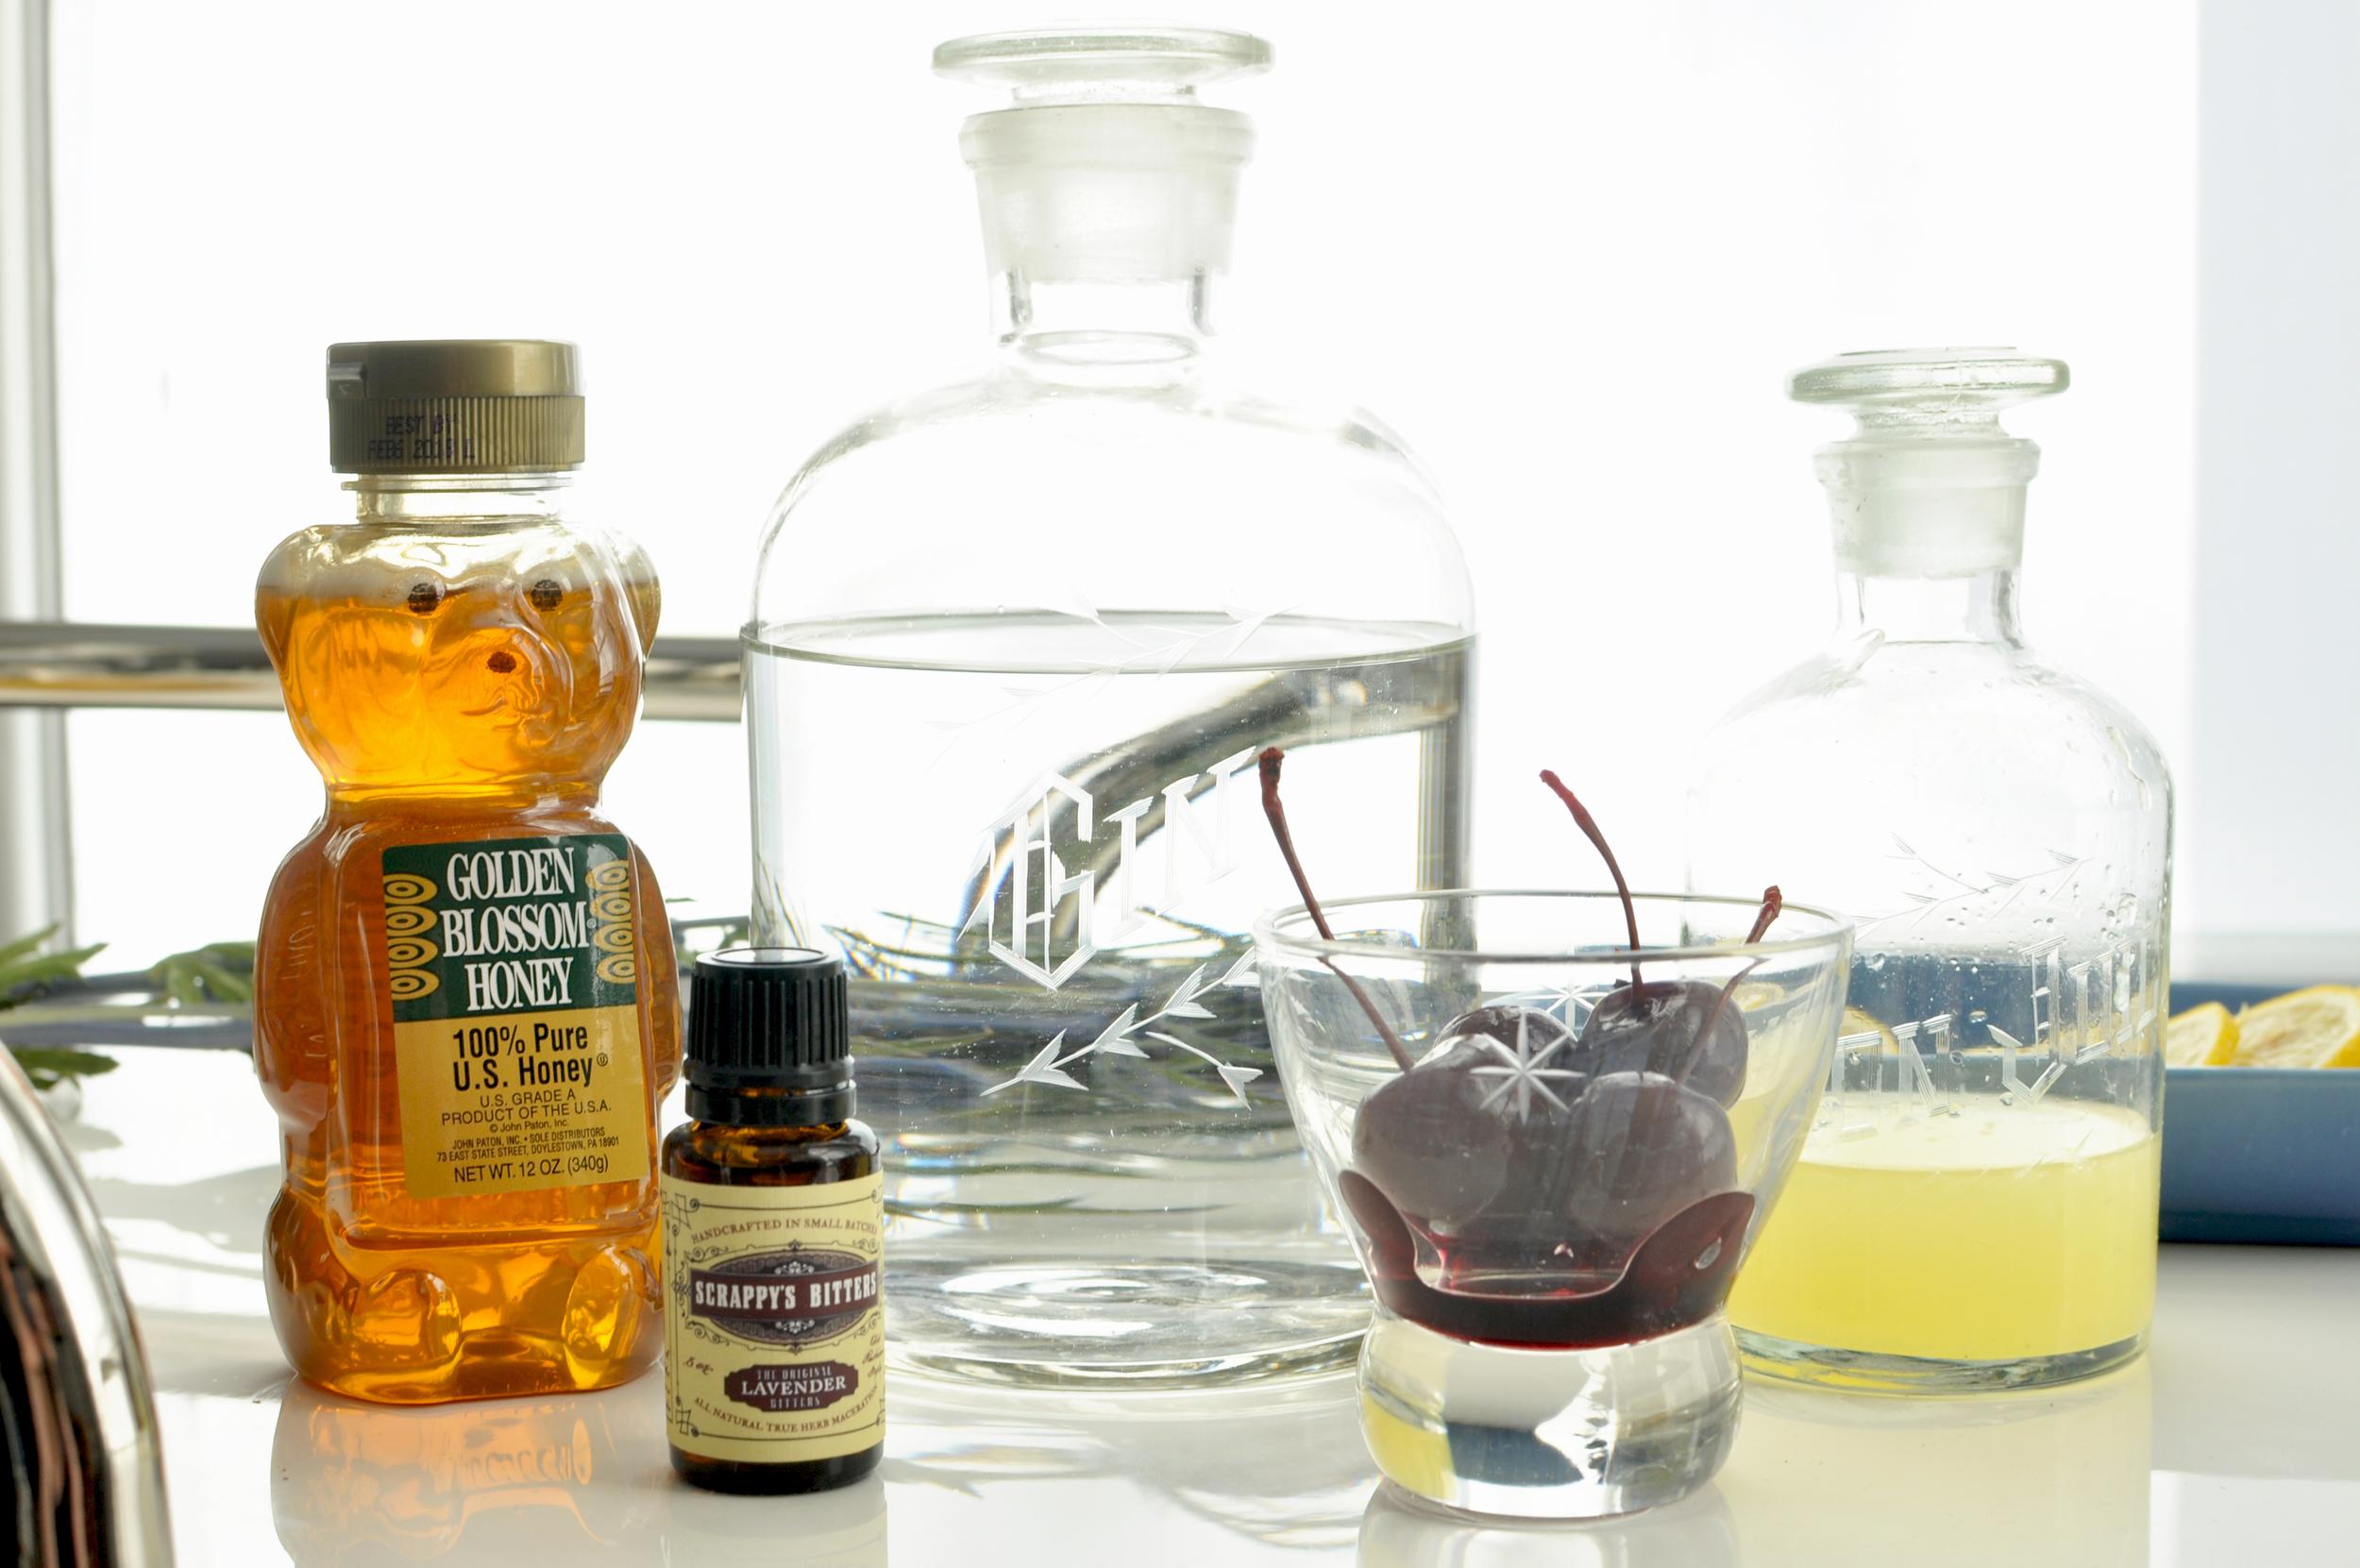 BEE'S KNEES RECIPE AUSTIN BAR GLASSES GIN DECANTER